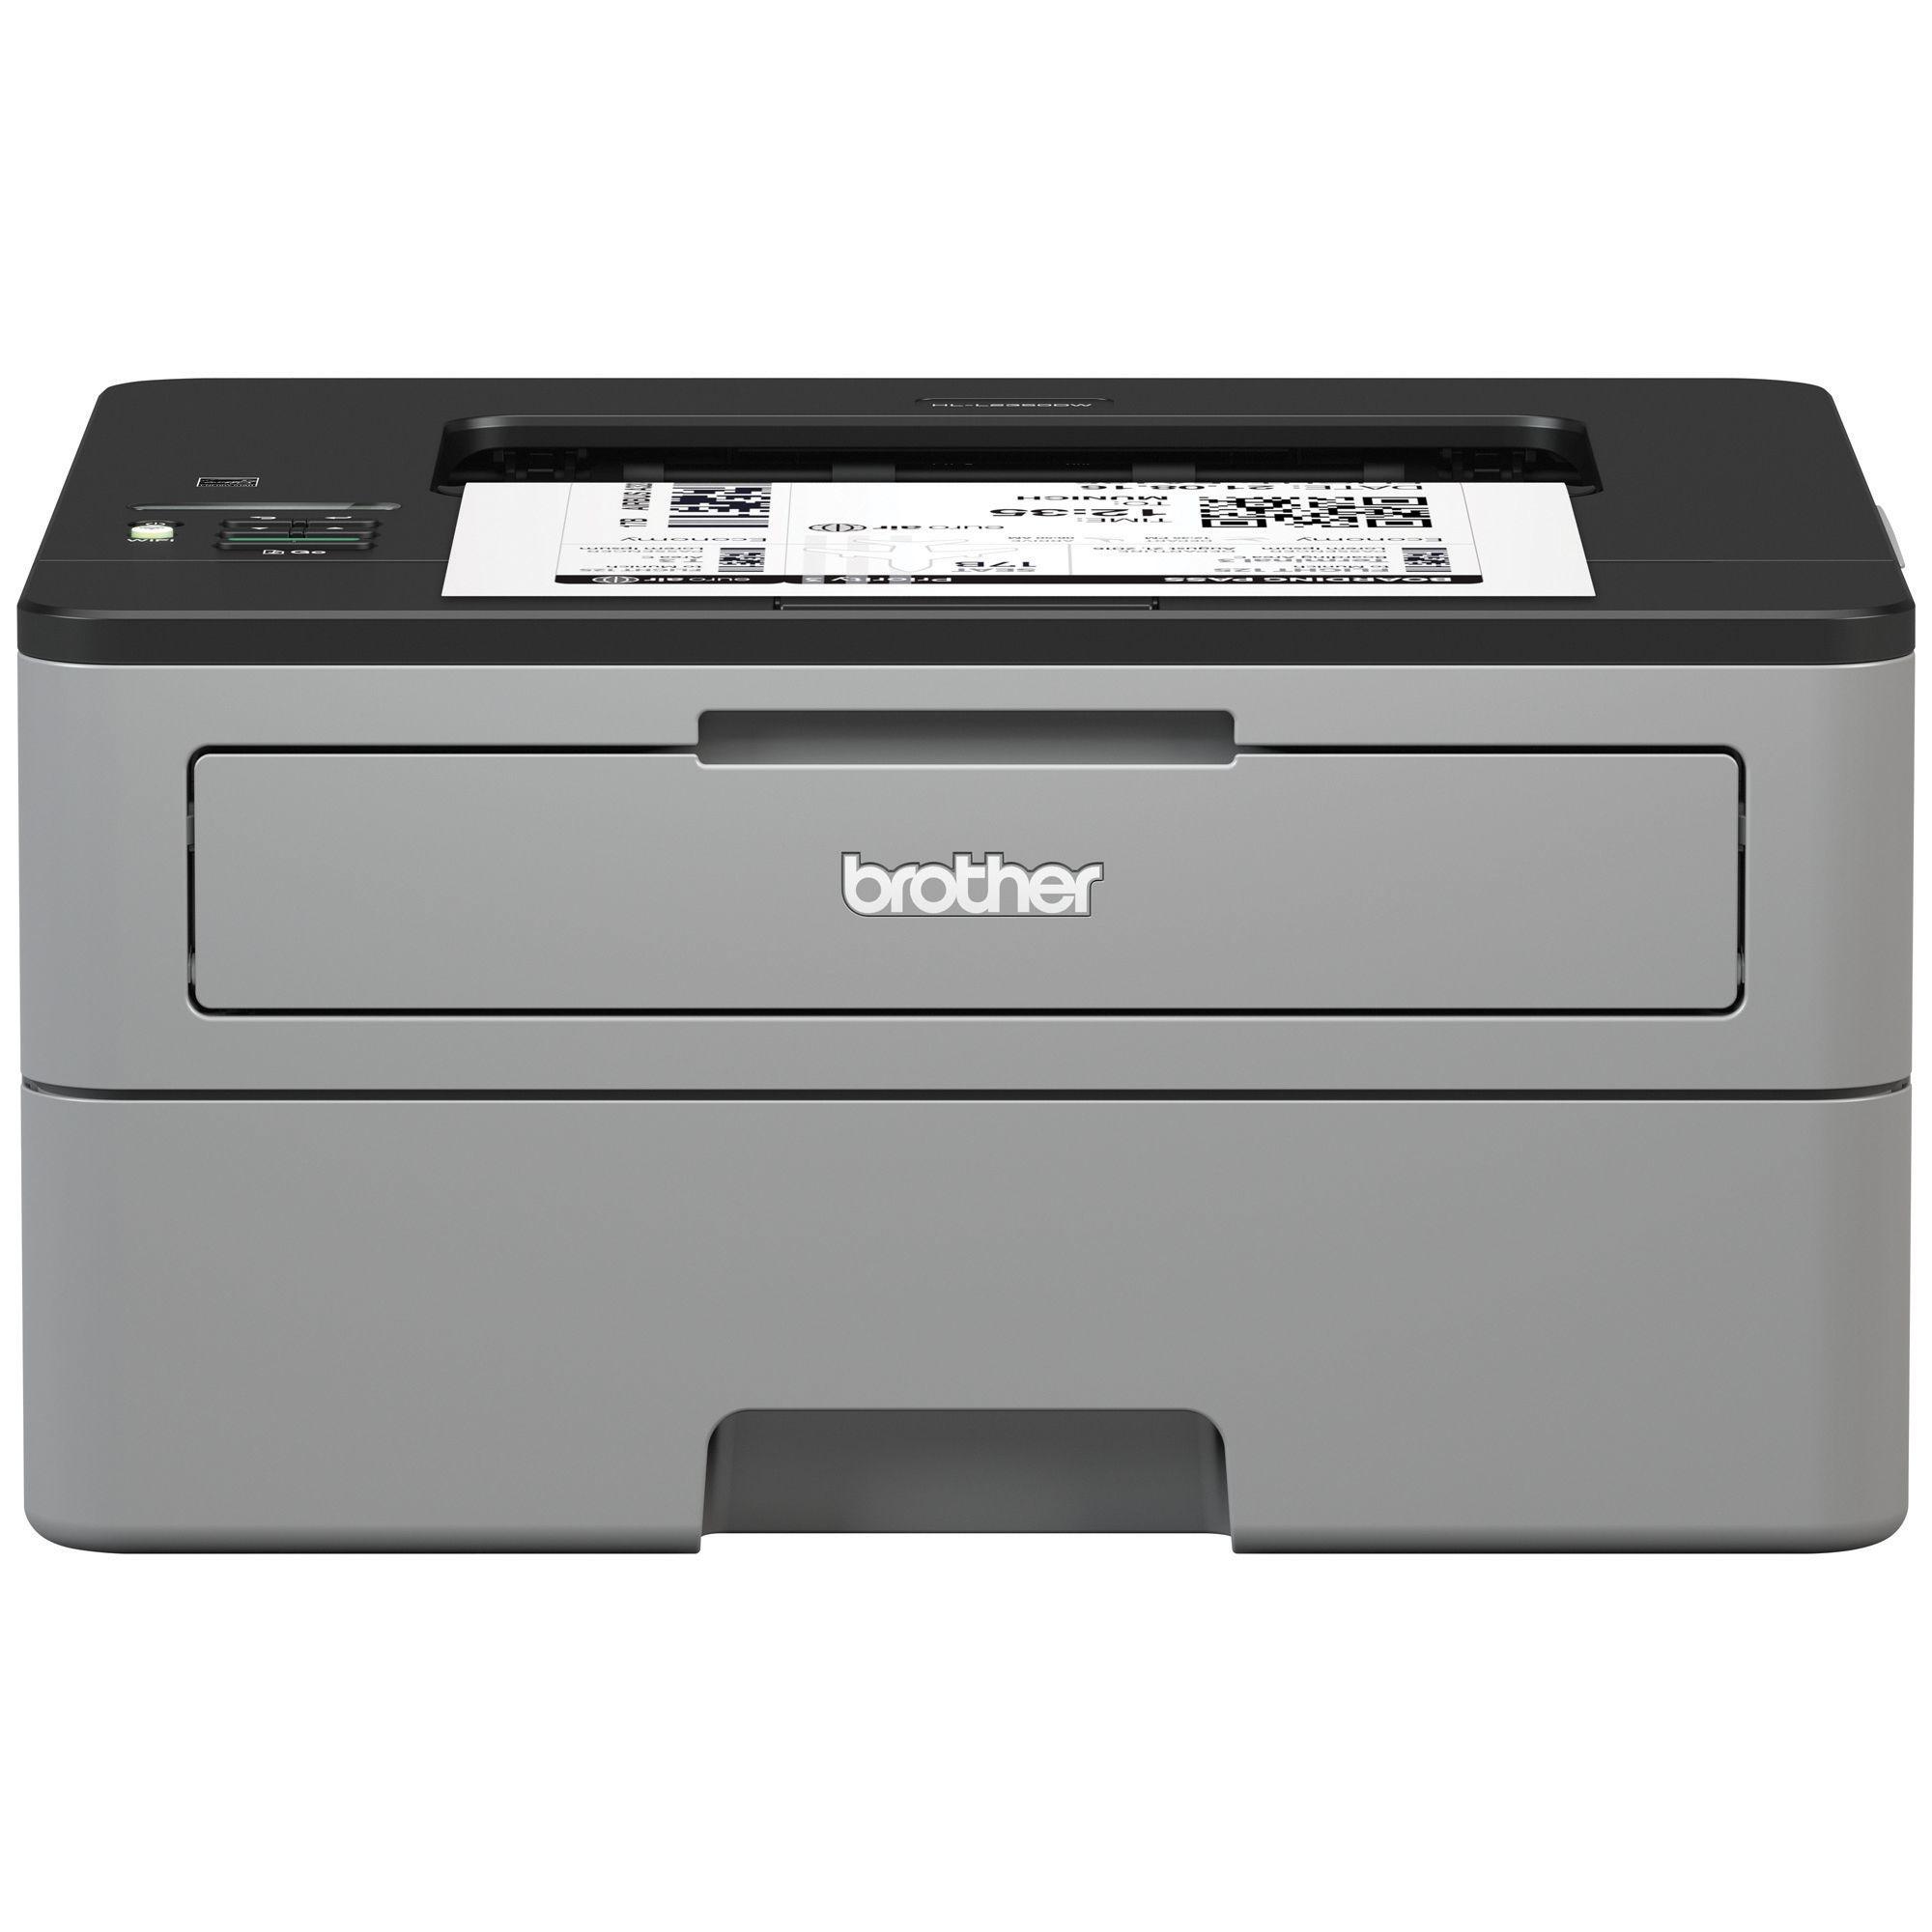 Brother Hl L2350dw Monochrome Laser Printer Walmartcom